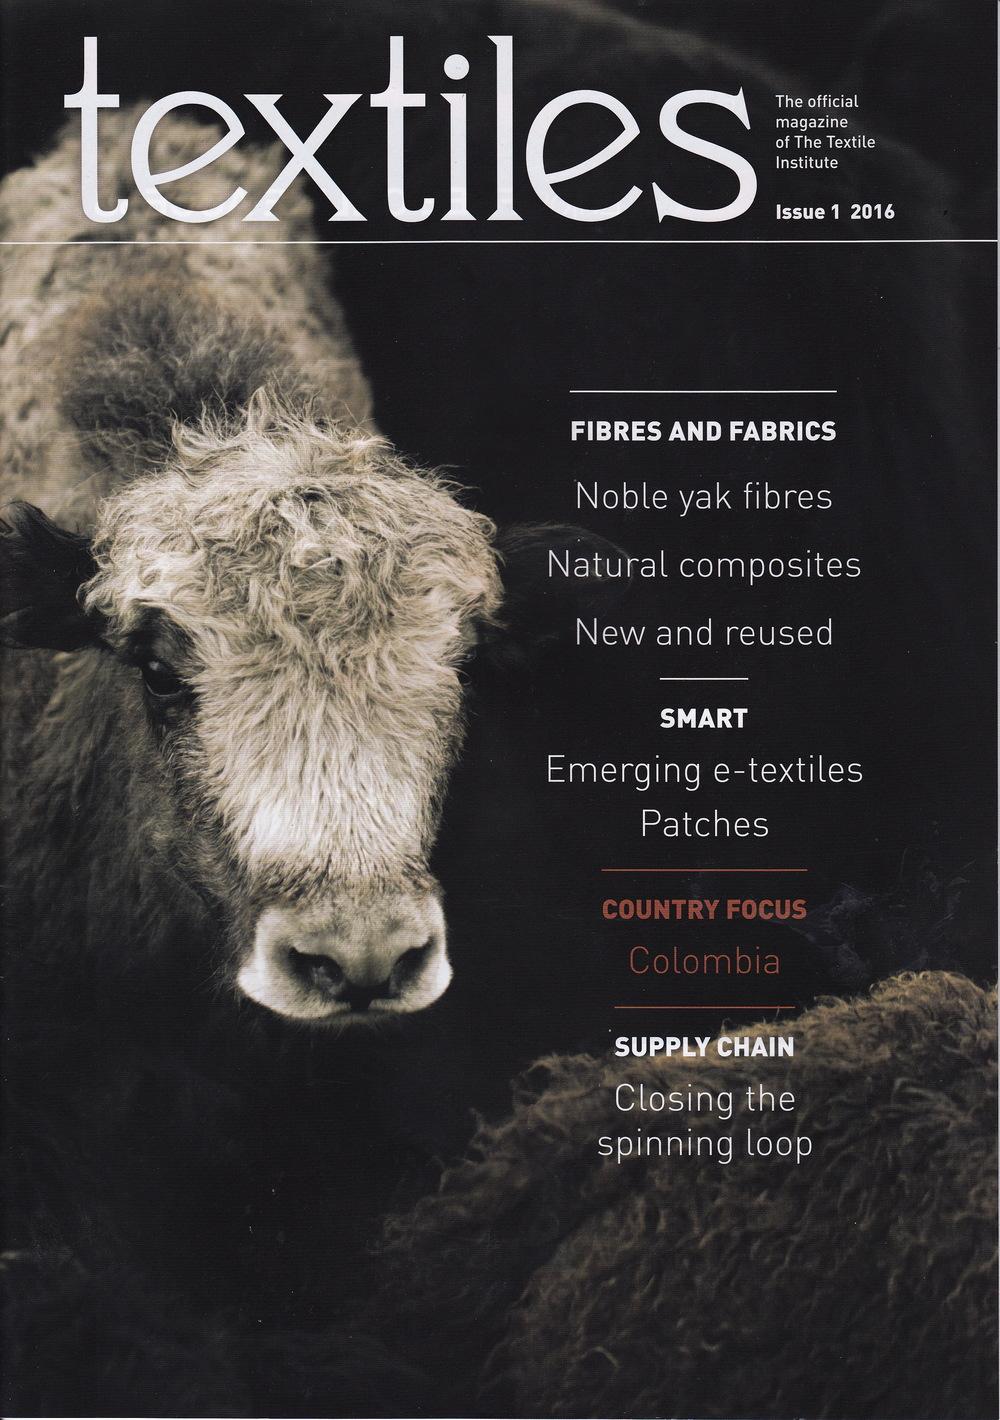 textiles_magazine_2016_tengri_1.jpg